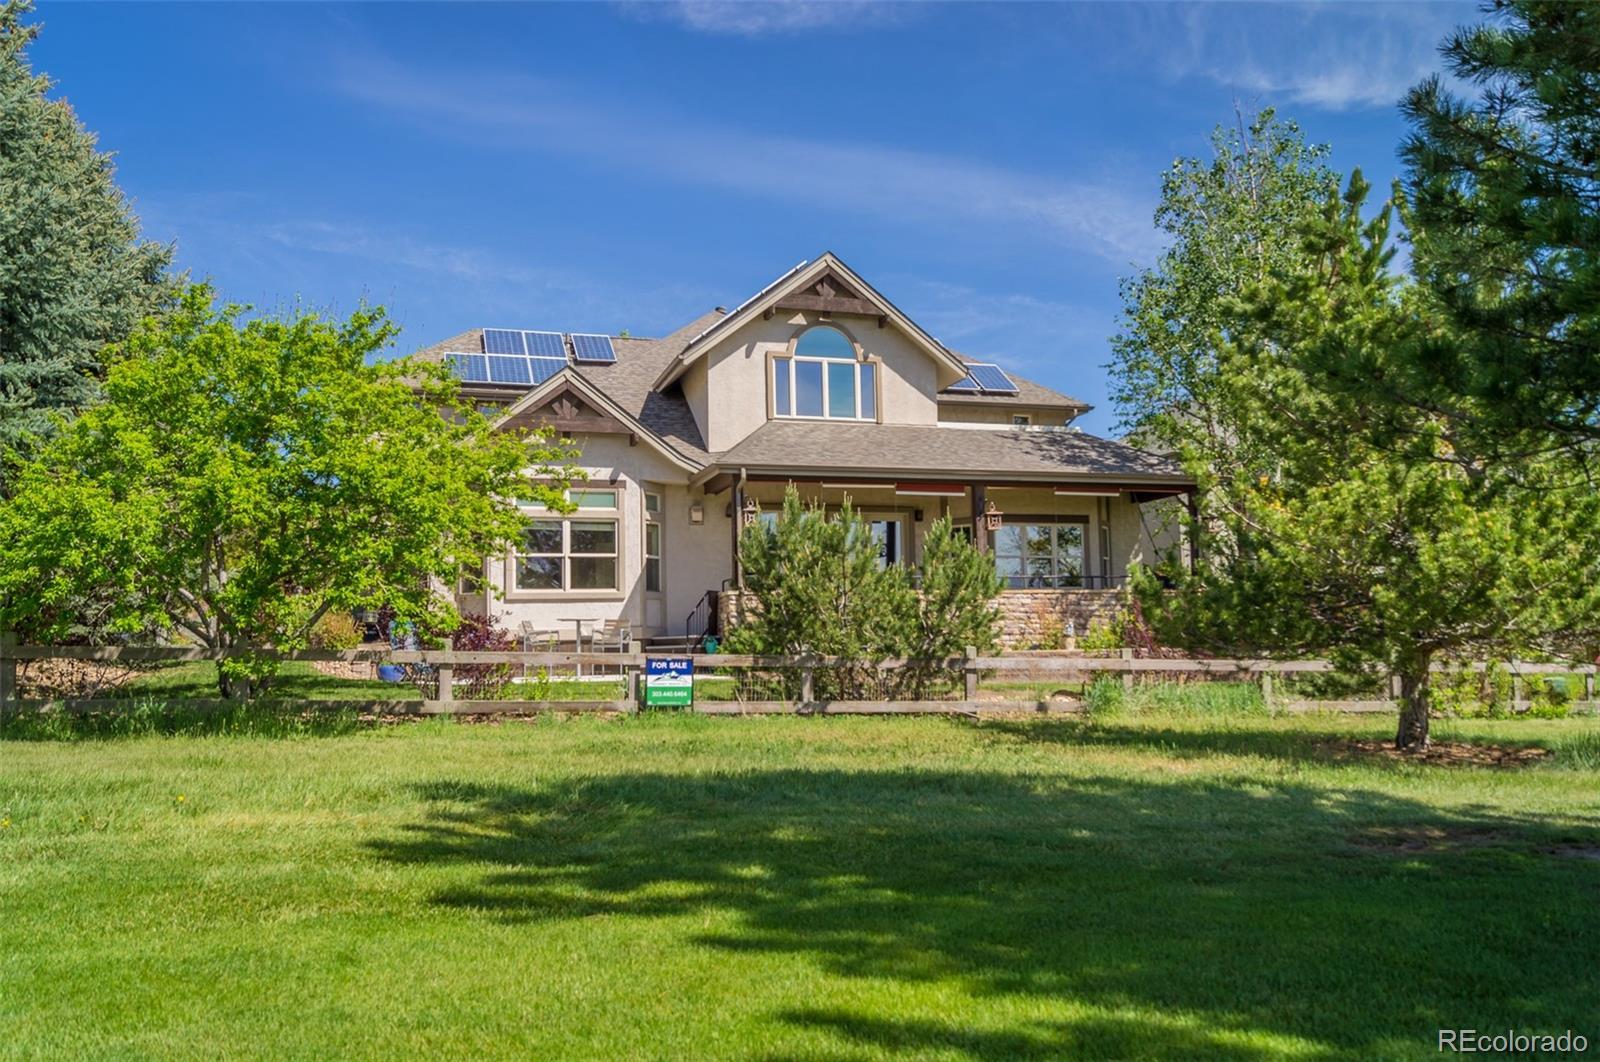 714 Skywalker Point Property Photo - Lafayette, CO real estate listing